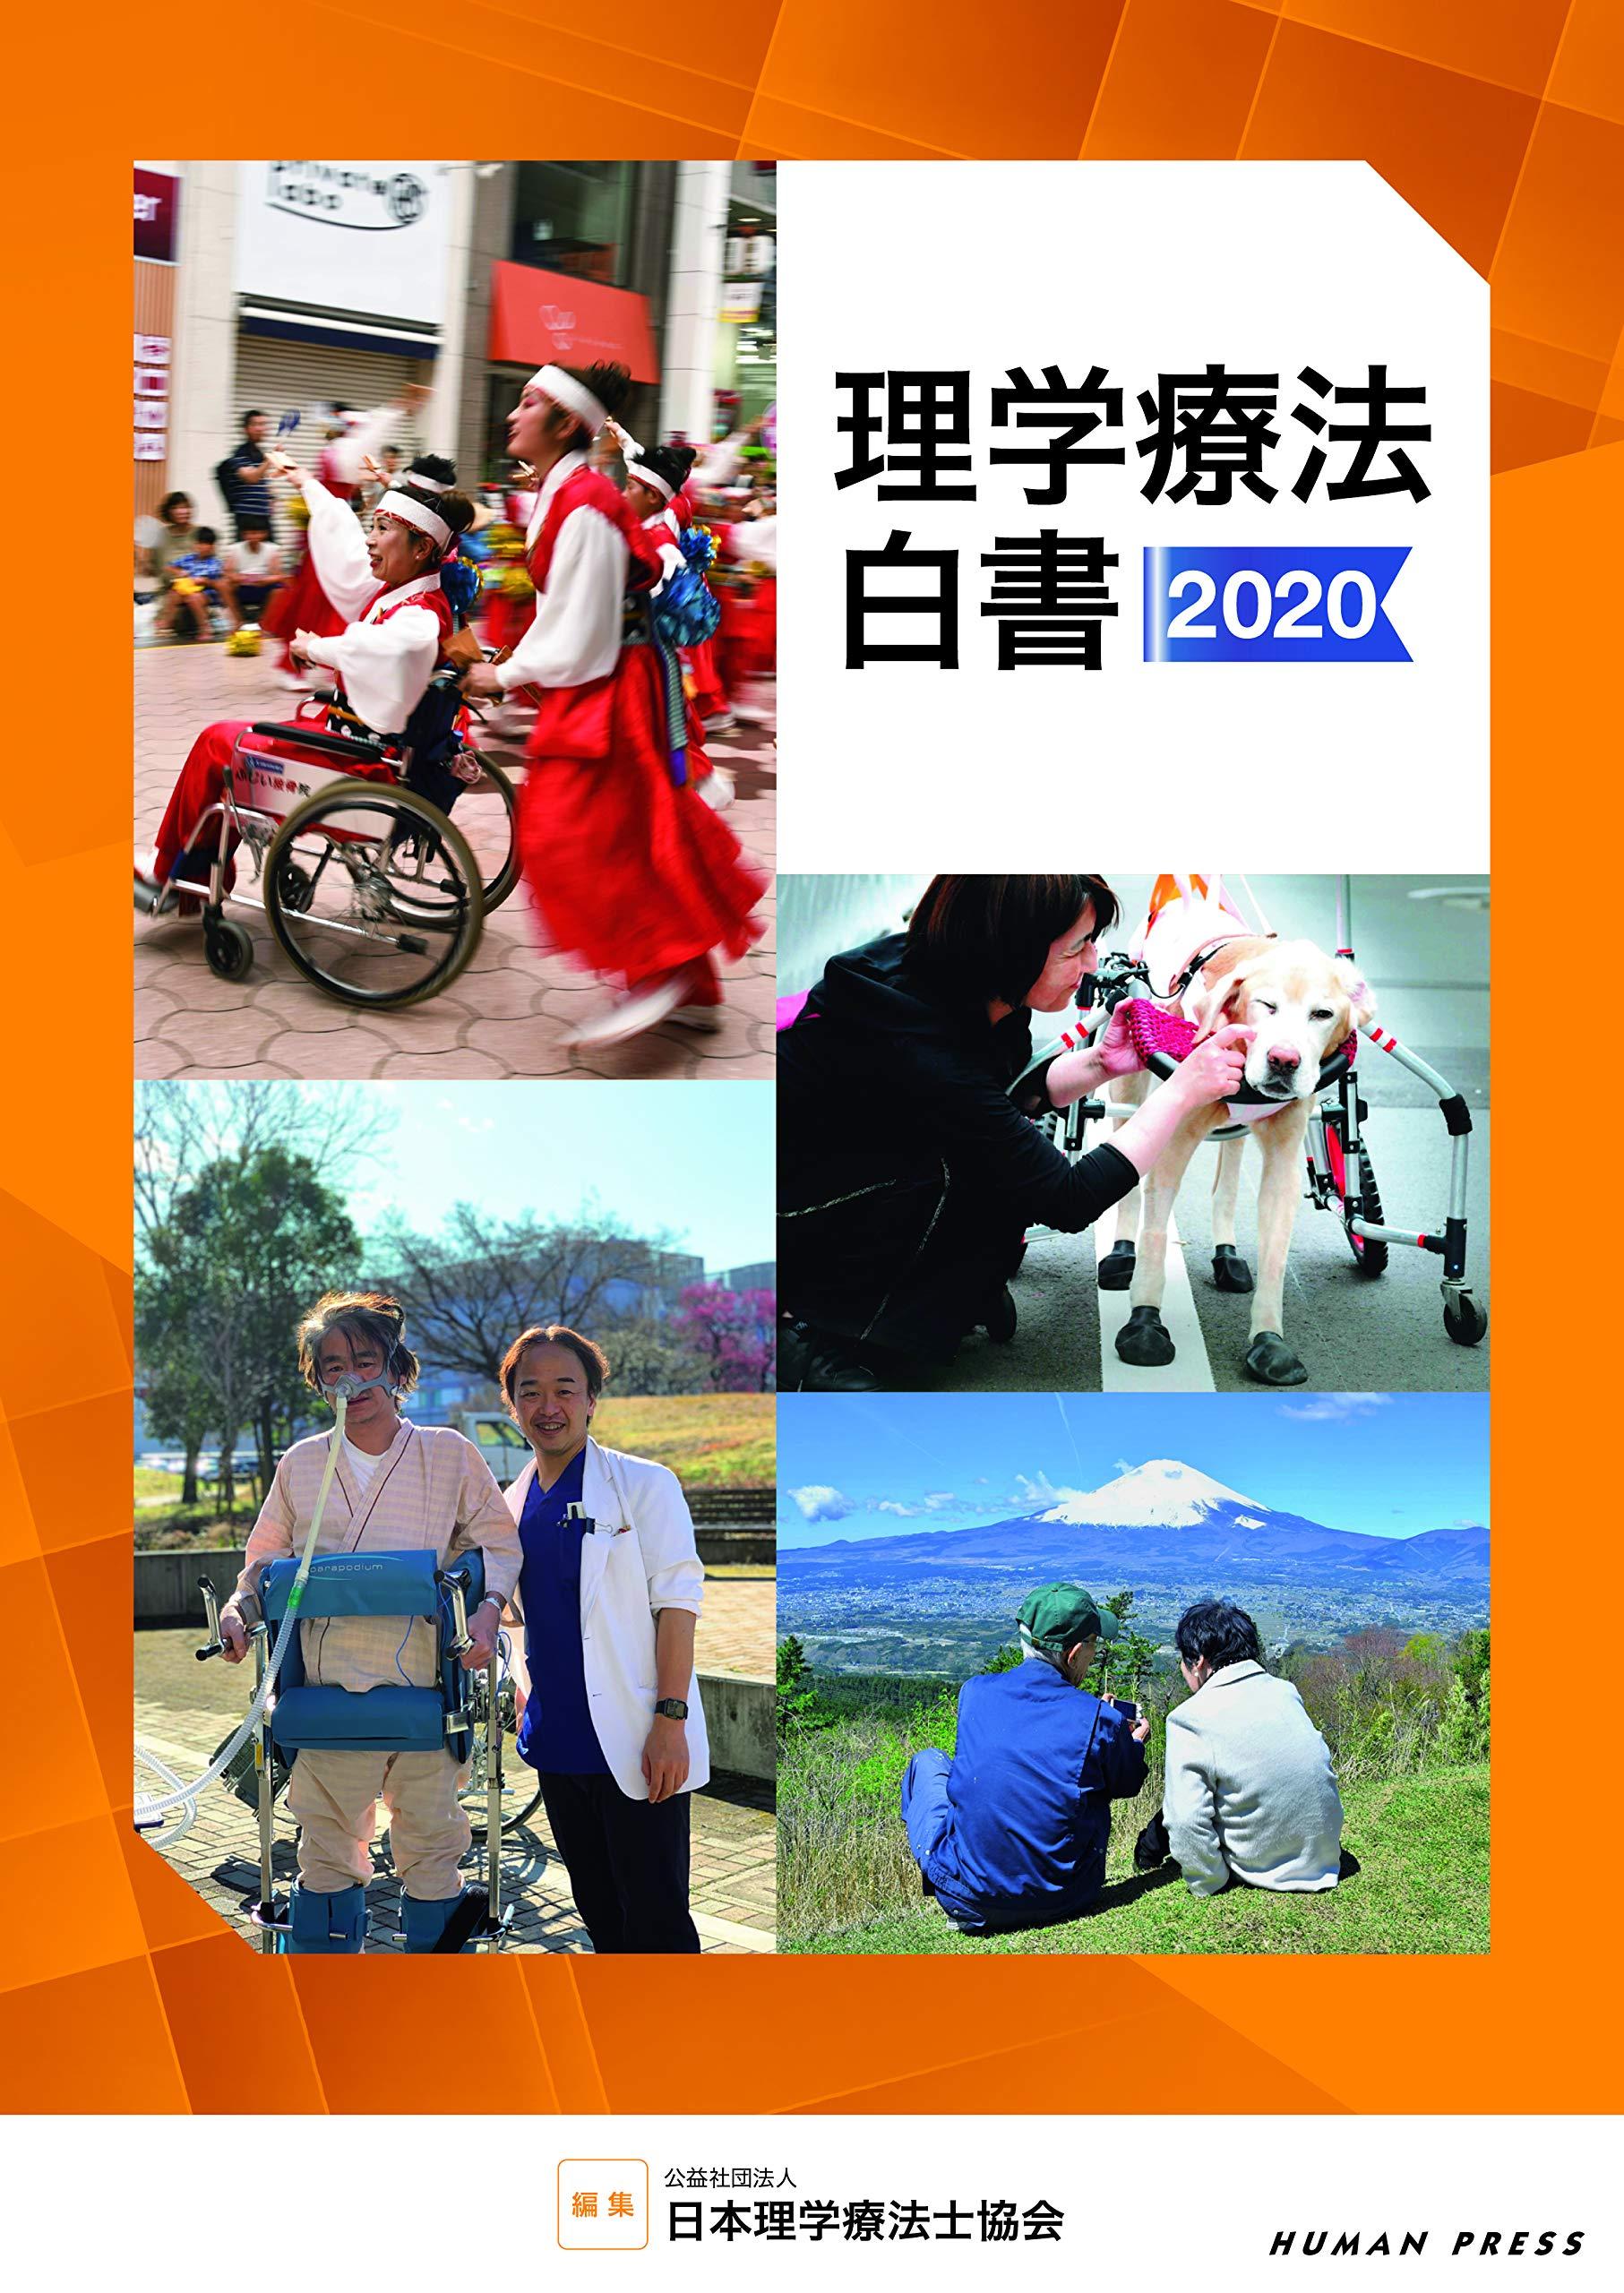 理学 協会 日本 療法 マイ ページ 士 社団法人日本理学療法士協会 賠償責任保険のご案内